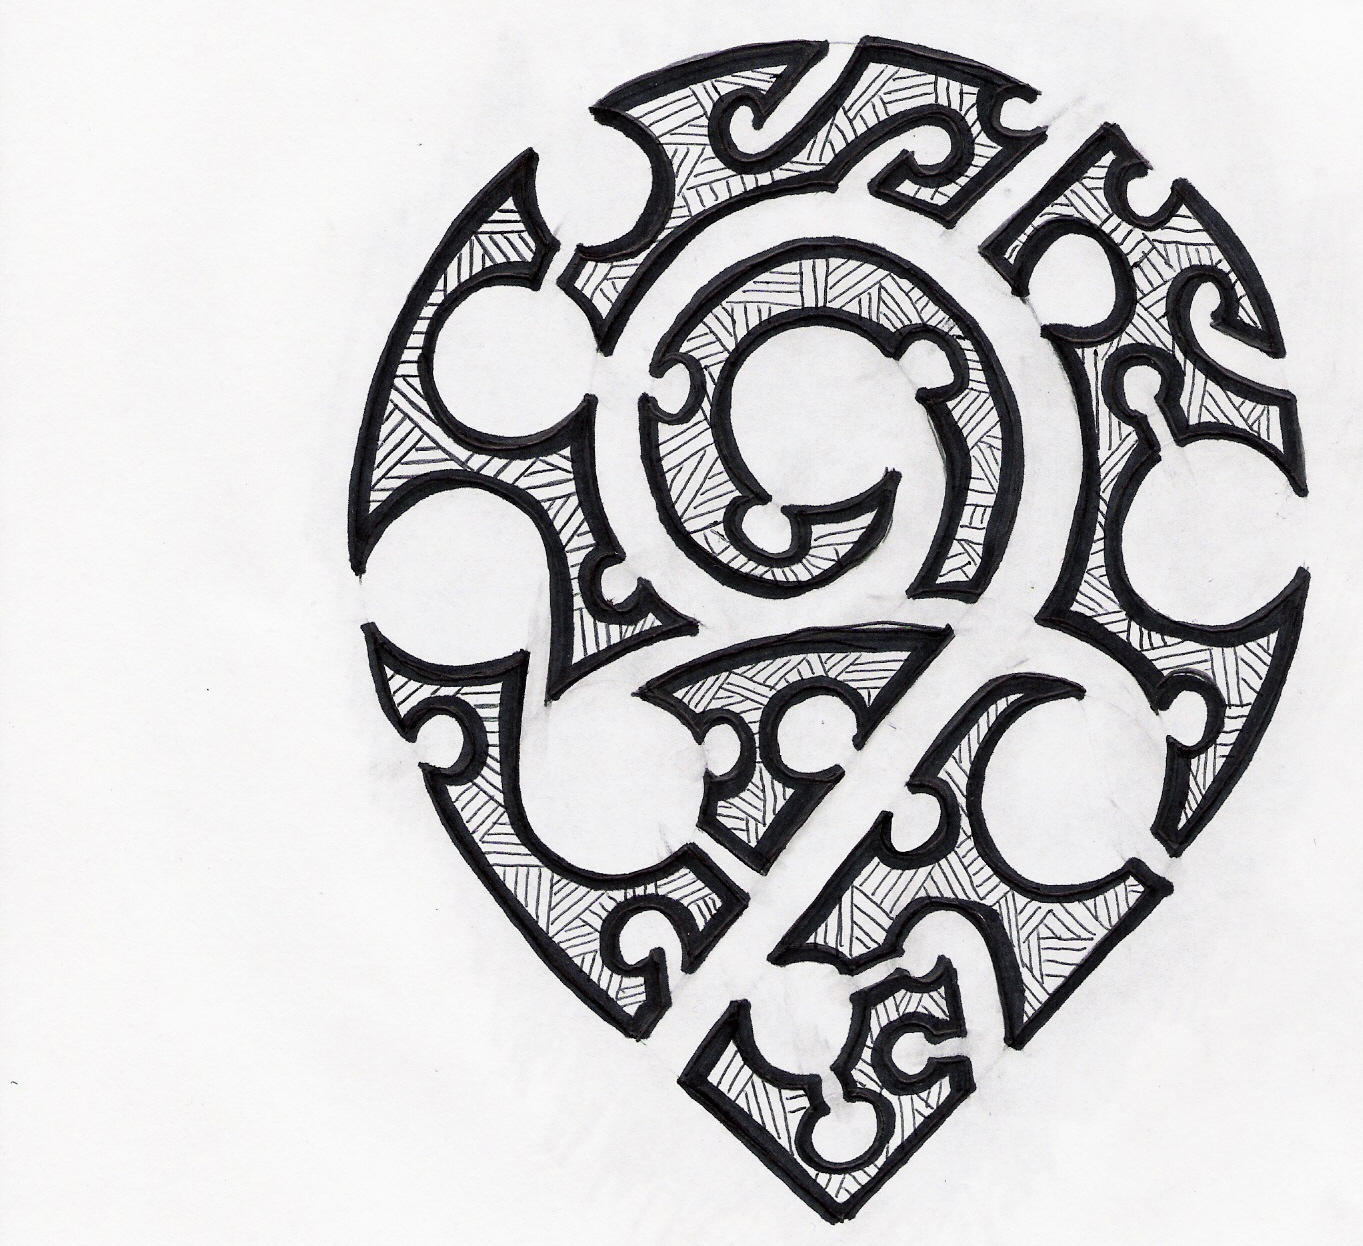 Maori Tattoo Designs Wallpaper: Maori 2 By Moneyshot5148 On DeviantArt